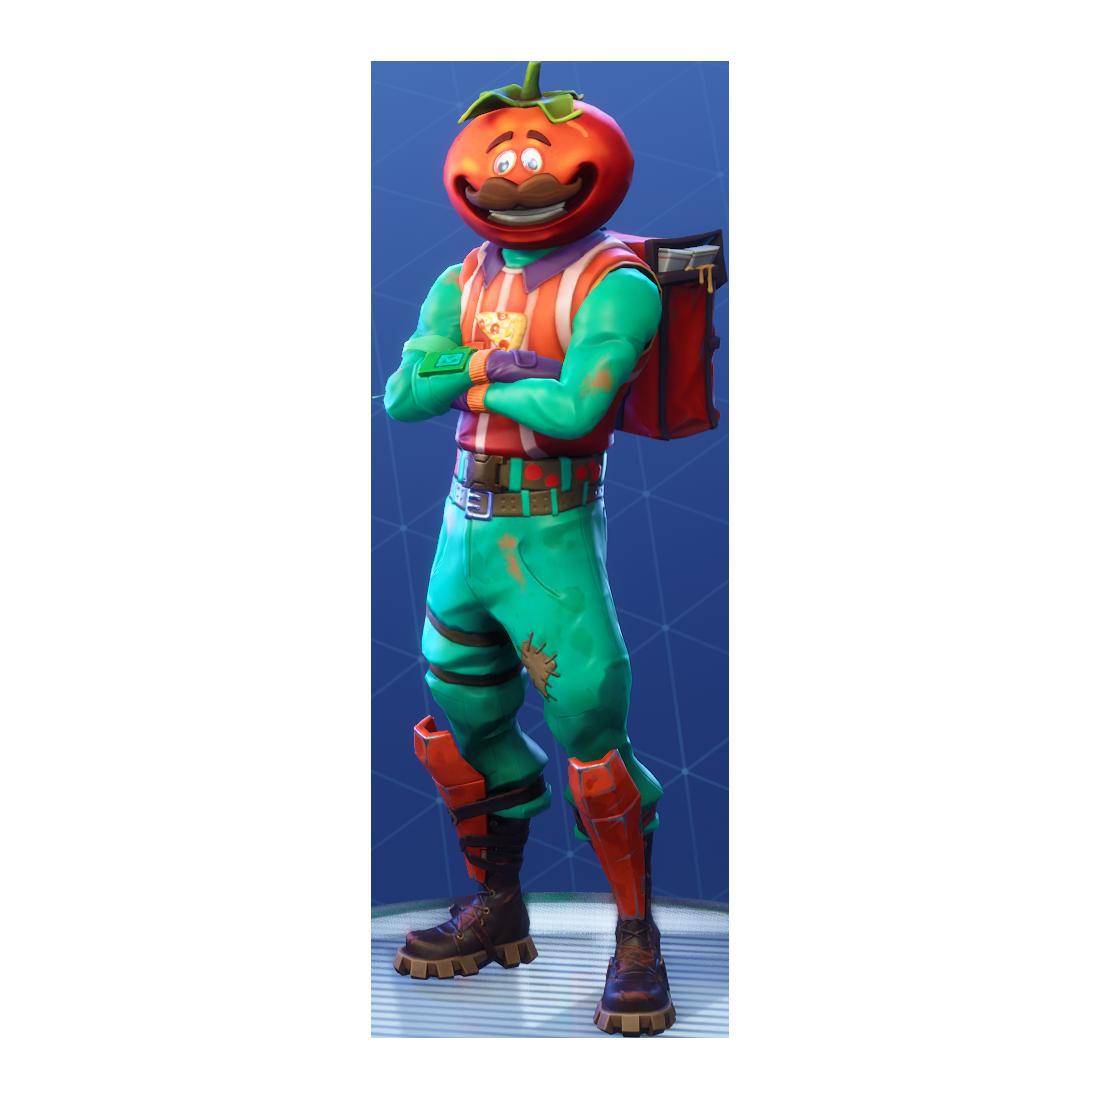 Tomatohead - Синьор помидор (Tomatohead)